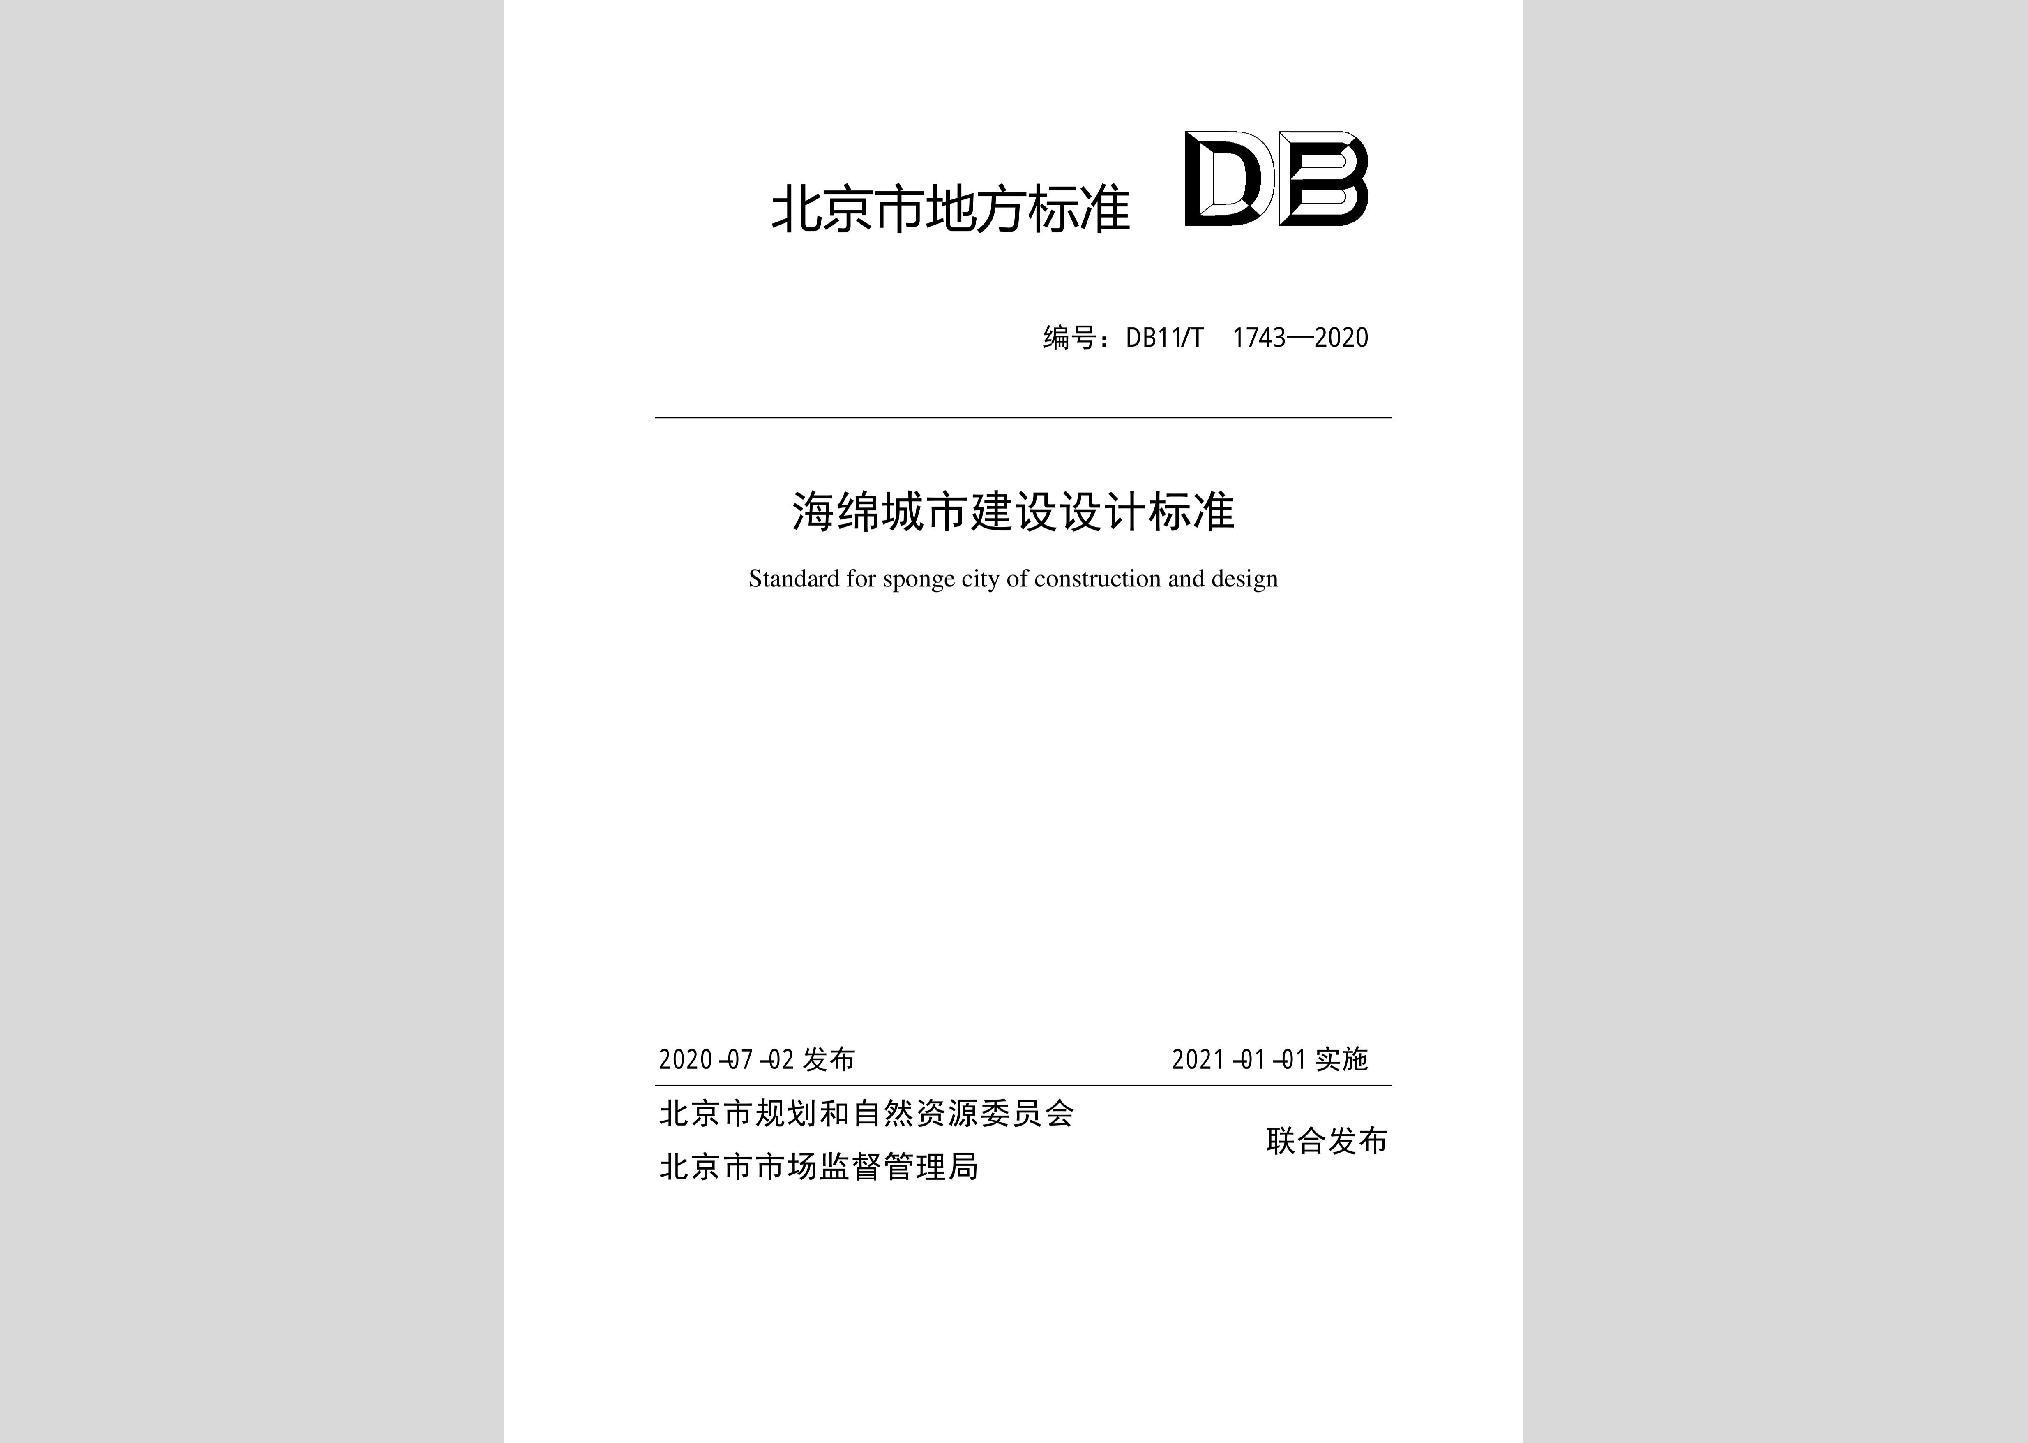 DB11/T1743-2020:海绵城市建设设计标准